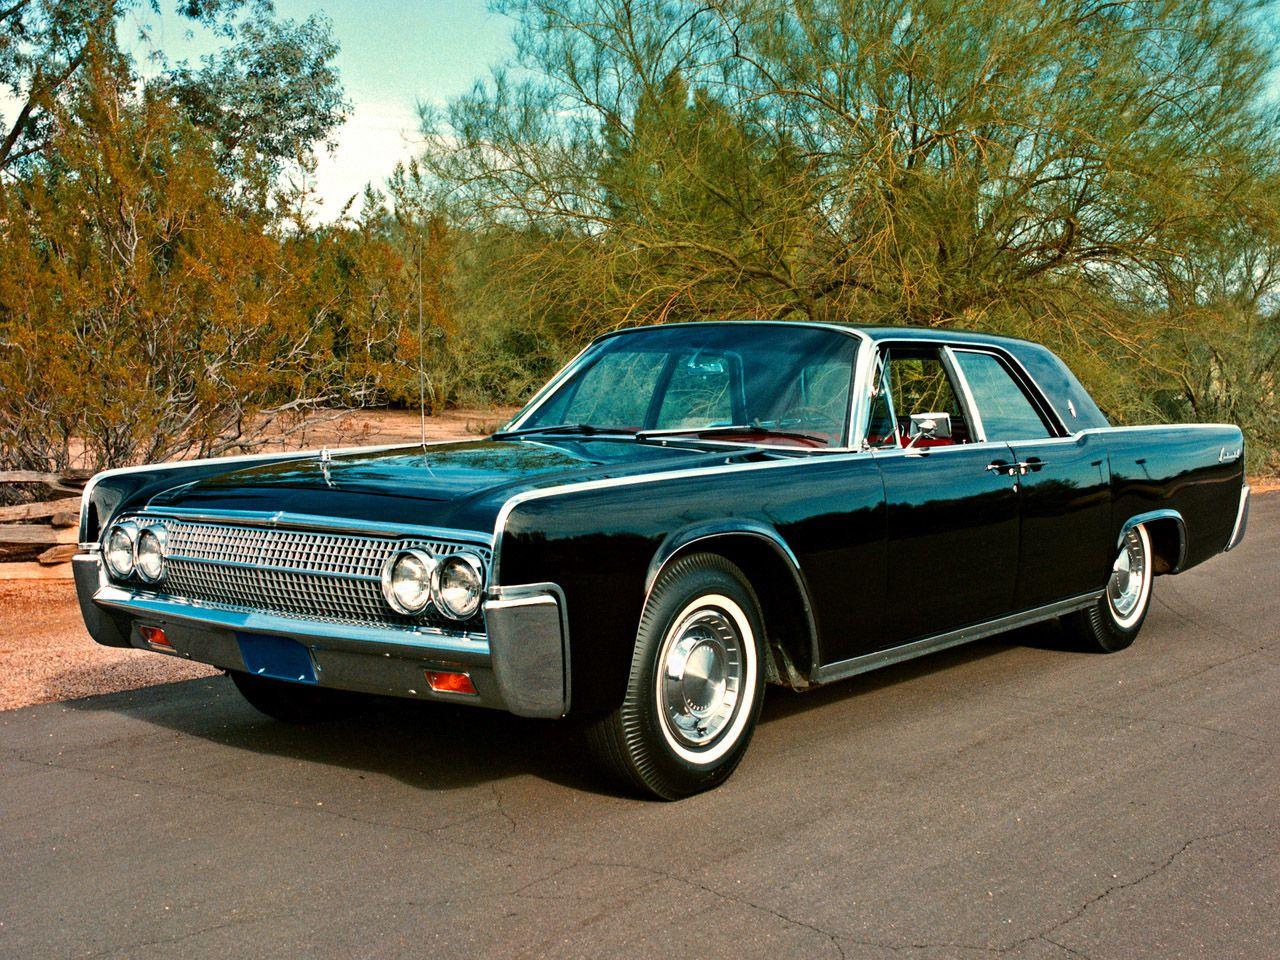 1964 lincoln continental sedan dream cars pinterest lincoln continental sedans and cars. Black Bedroom Furniture Sets. Home Design Ideas